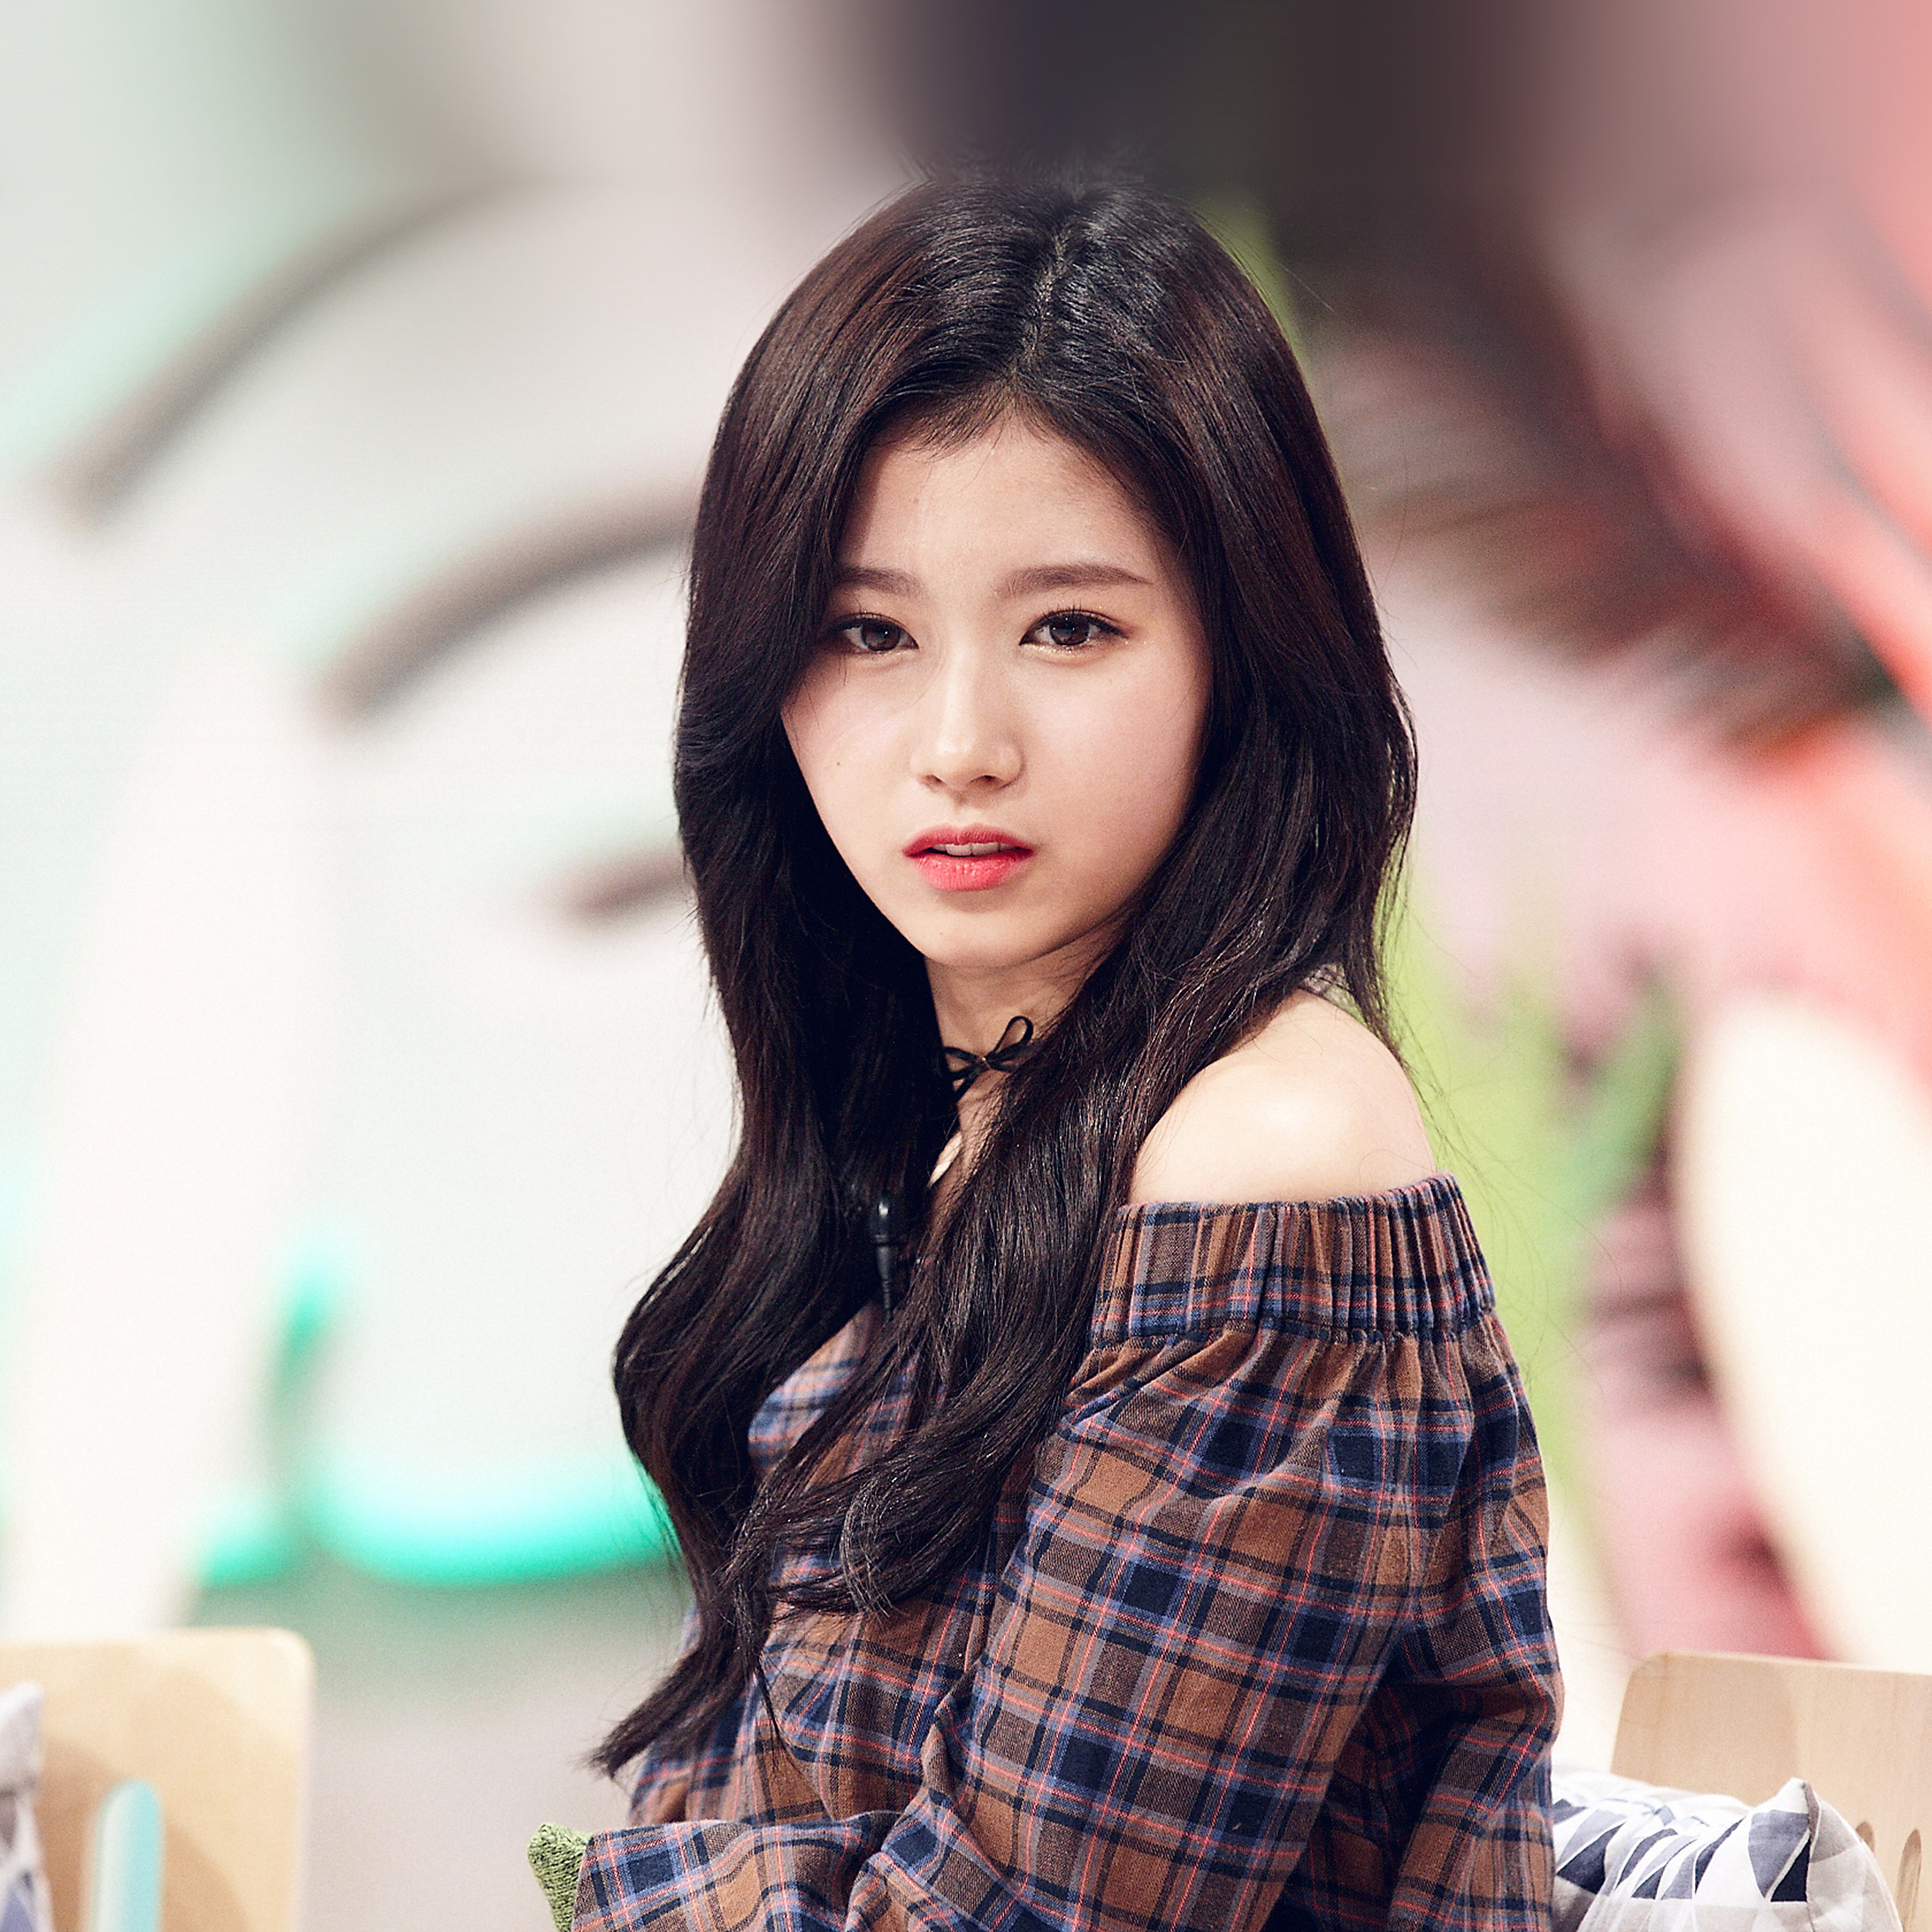 papers.co hl09 sana kpop cute girl celebrity 40 wallpaper